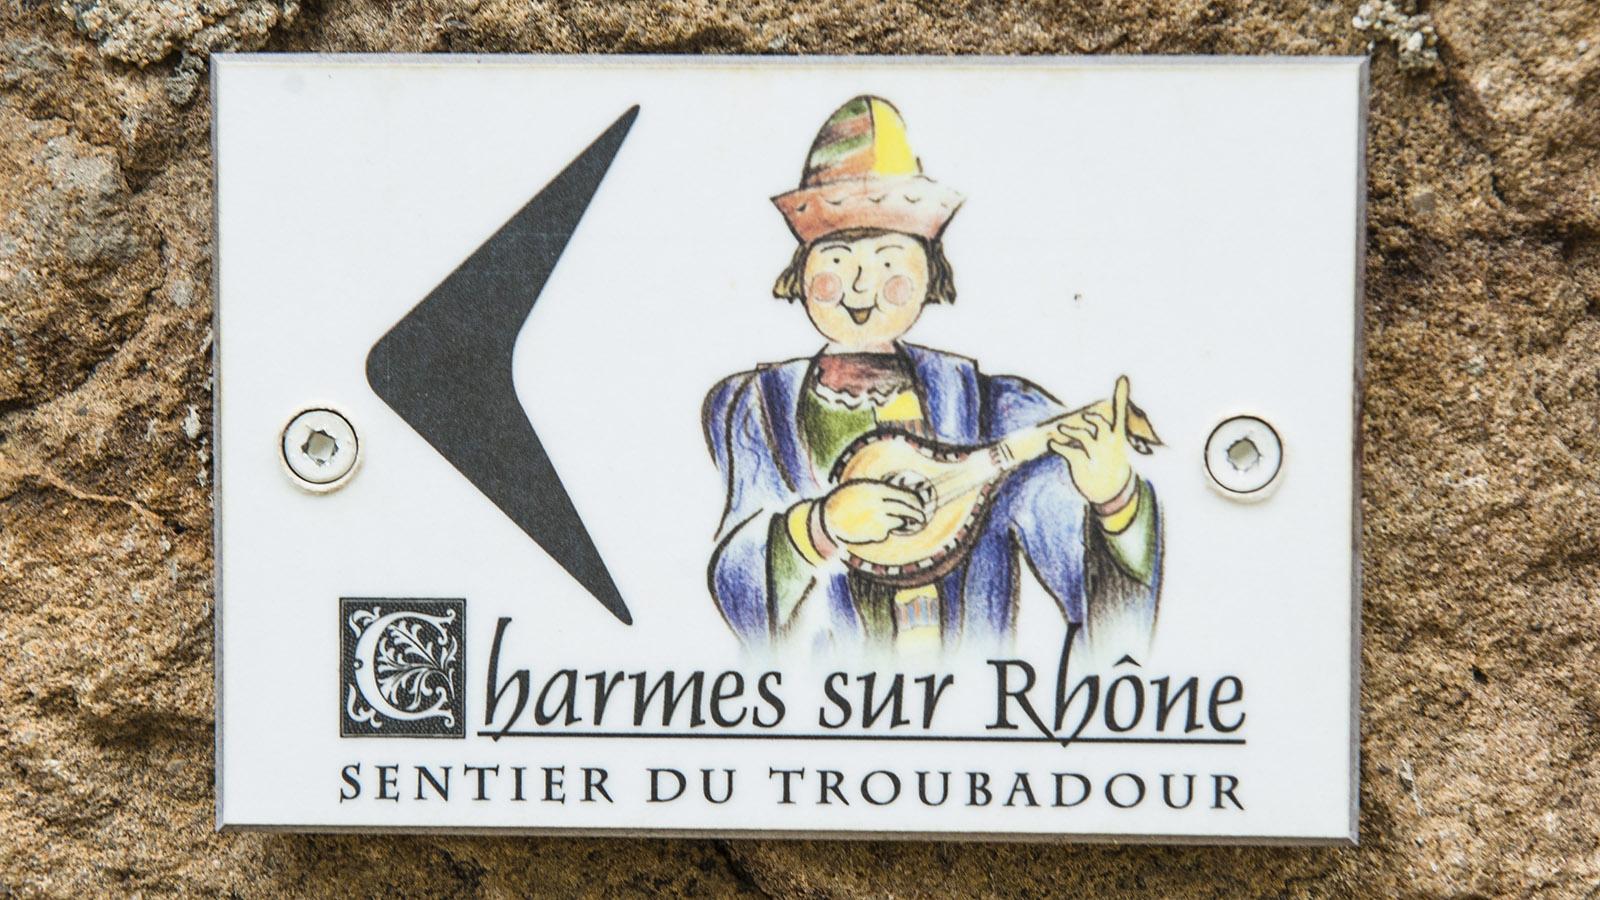 ViaRhôna: So ist der Sentier du Troubadour in Charmes-sur-Rhône markiert. Foto: Hilke Maunder